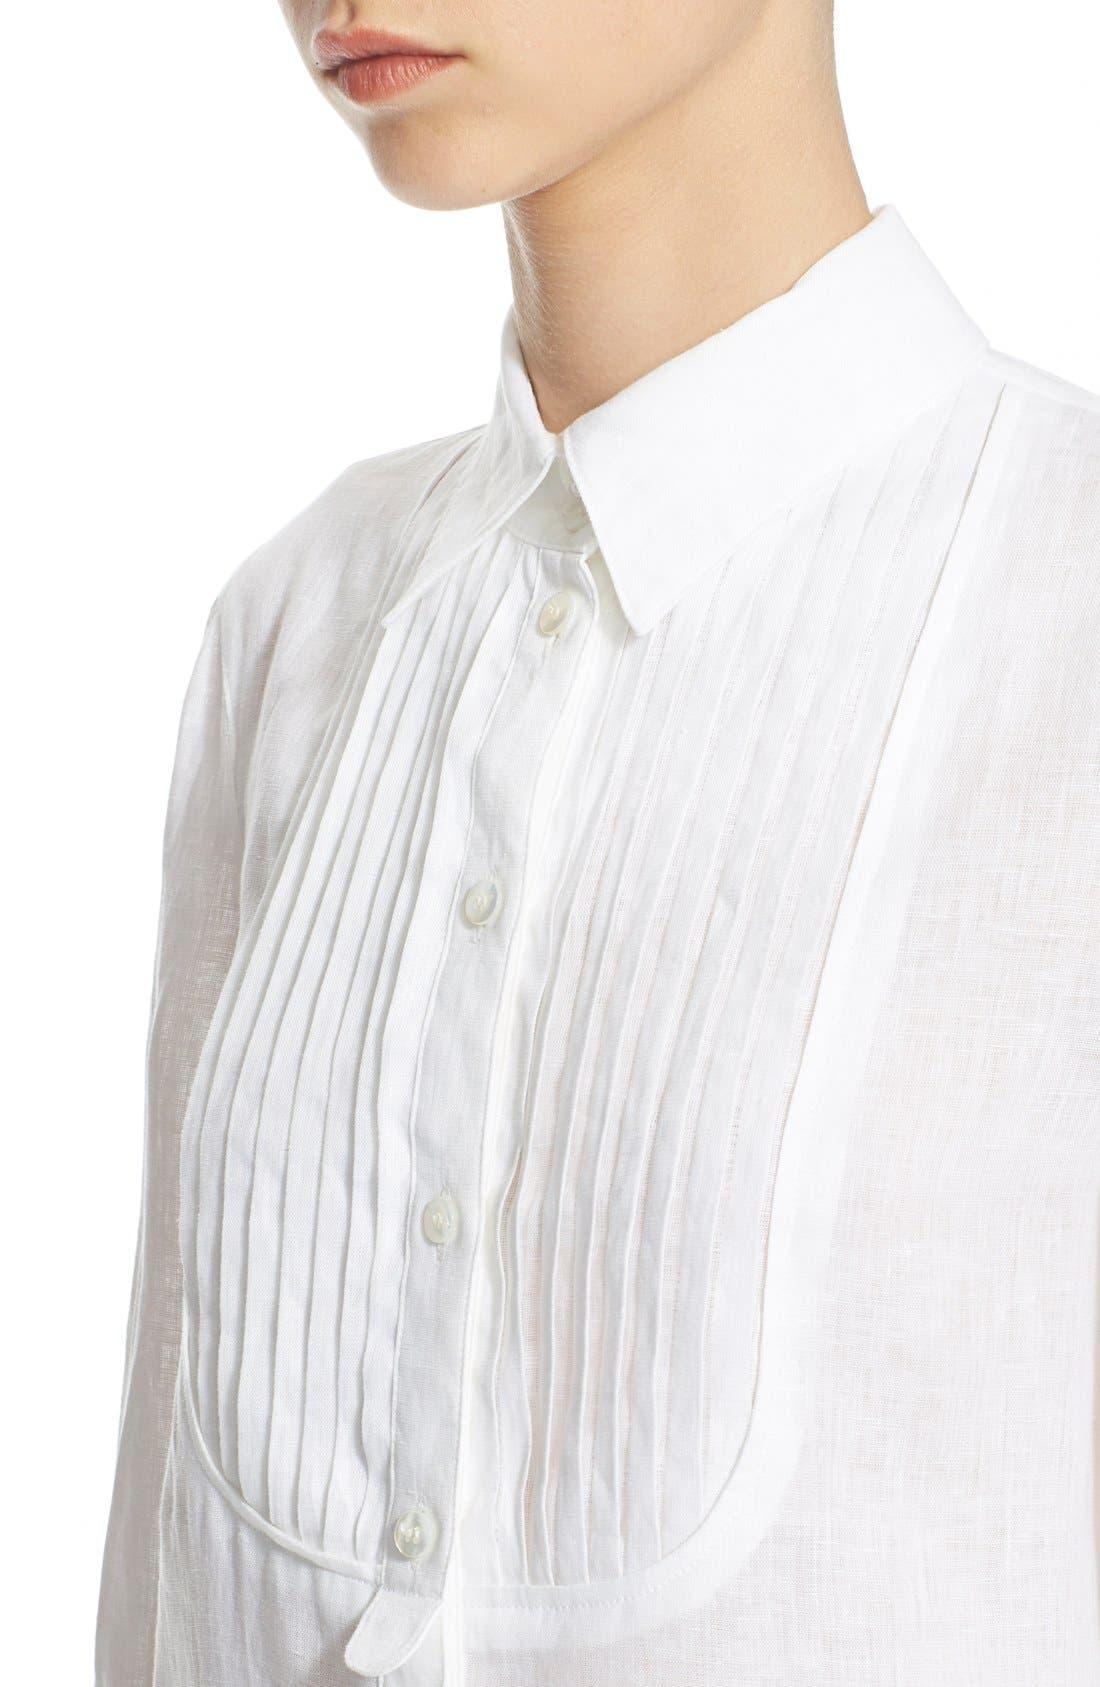 ARMANI COLLEZIONI,                             Linen Tuxedo Shirt,                             Alternate thumbnail 2, color,                             100